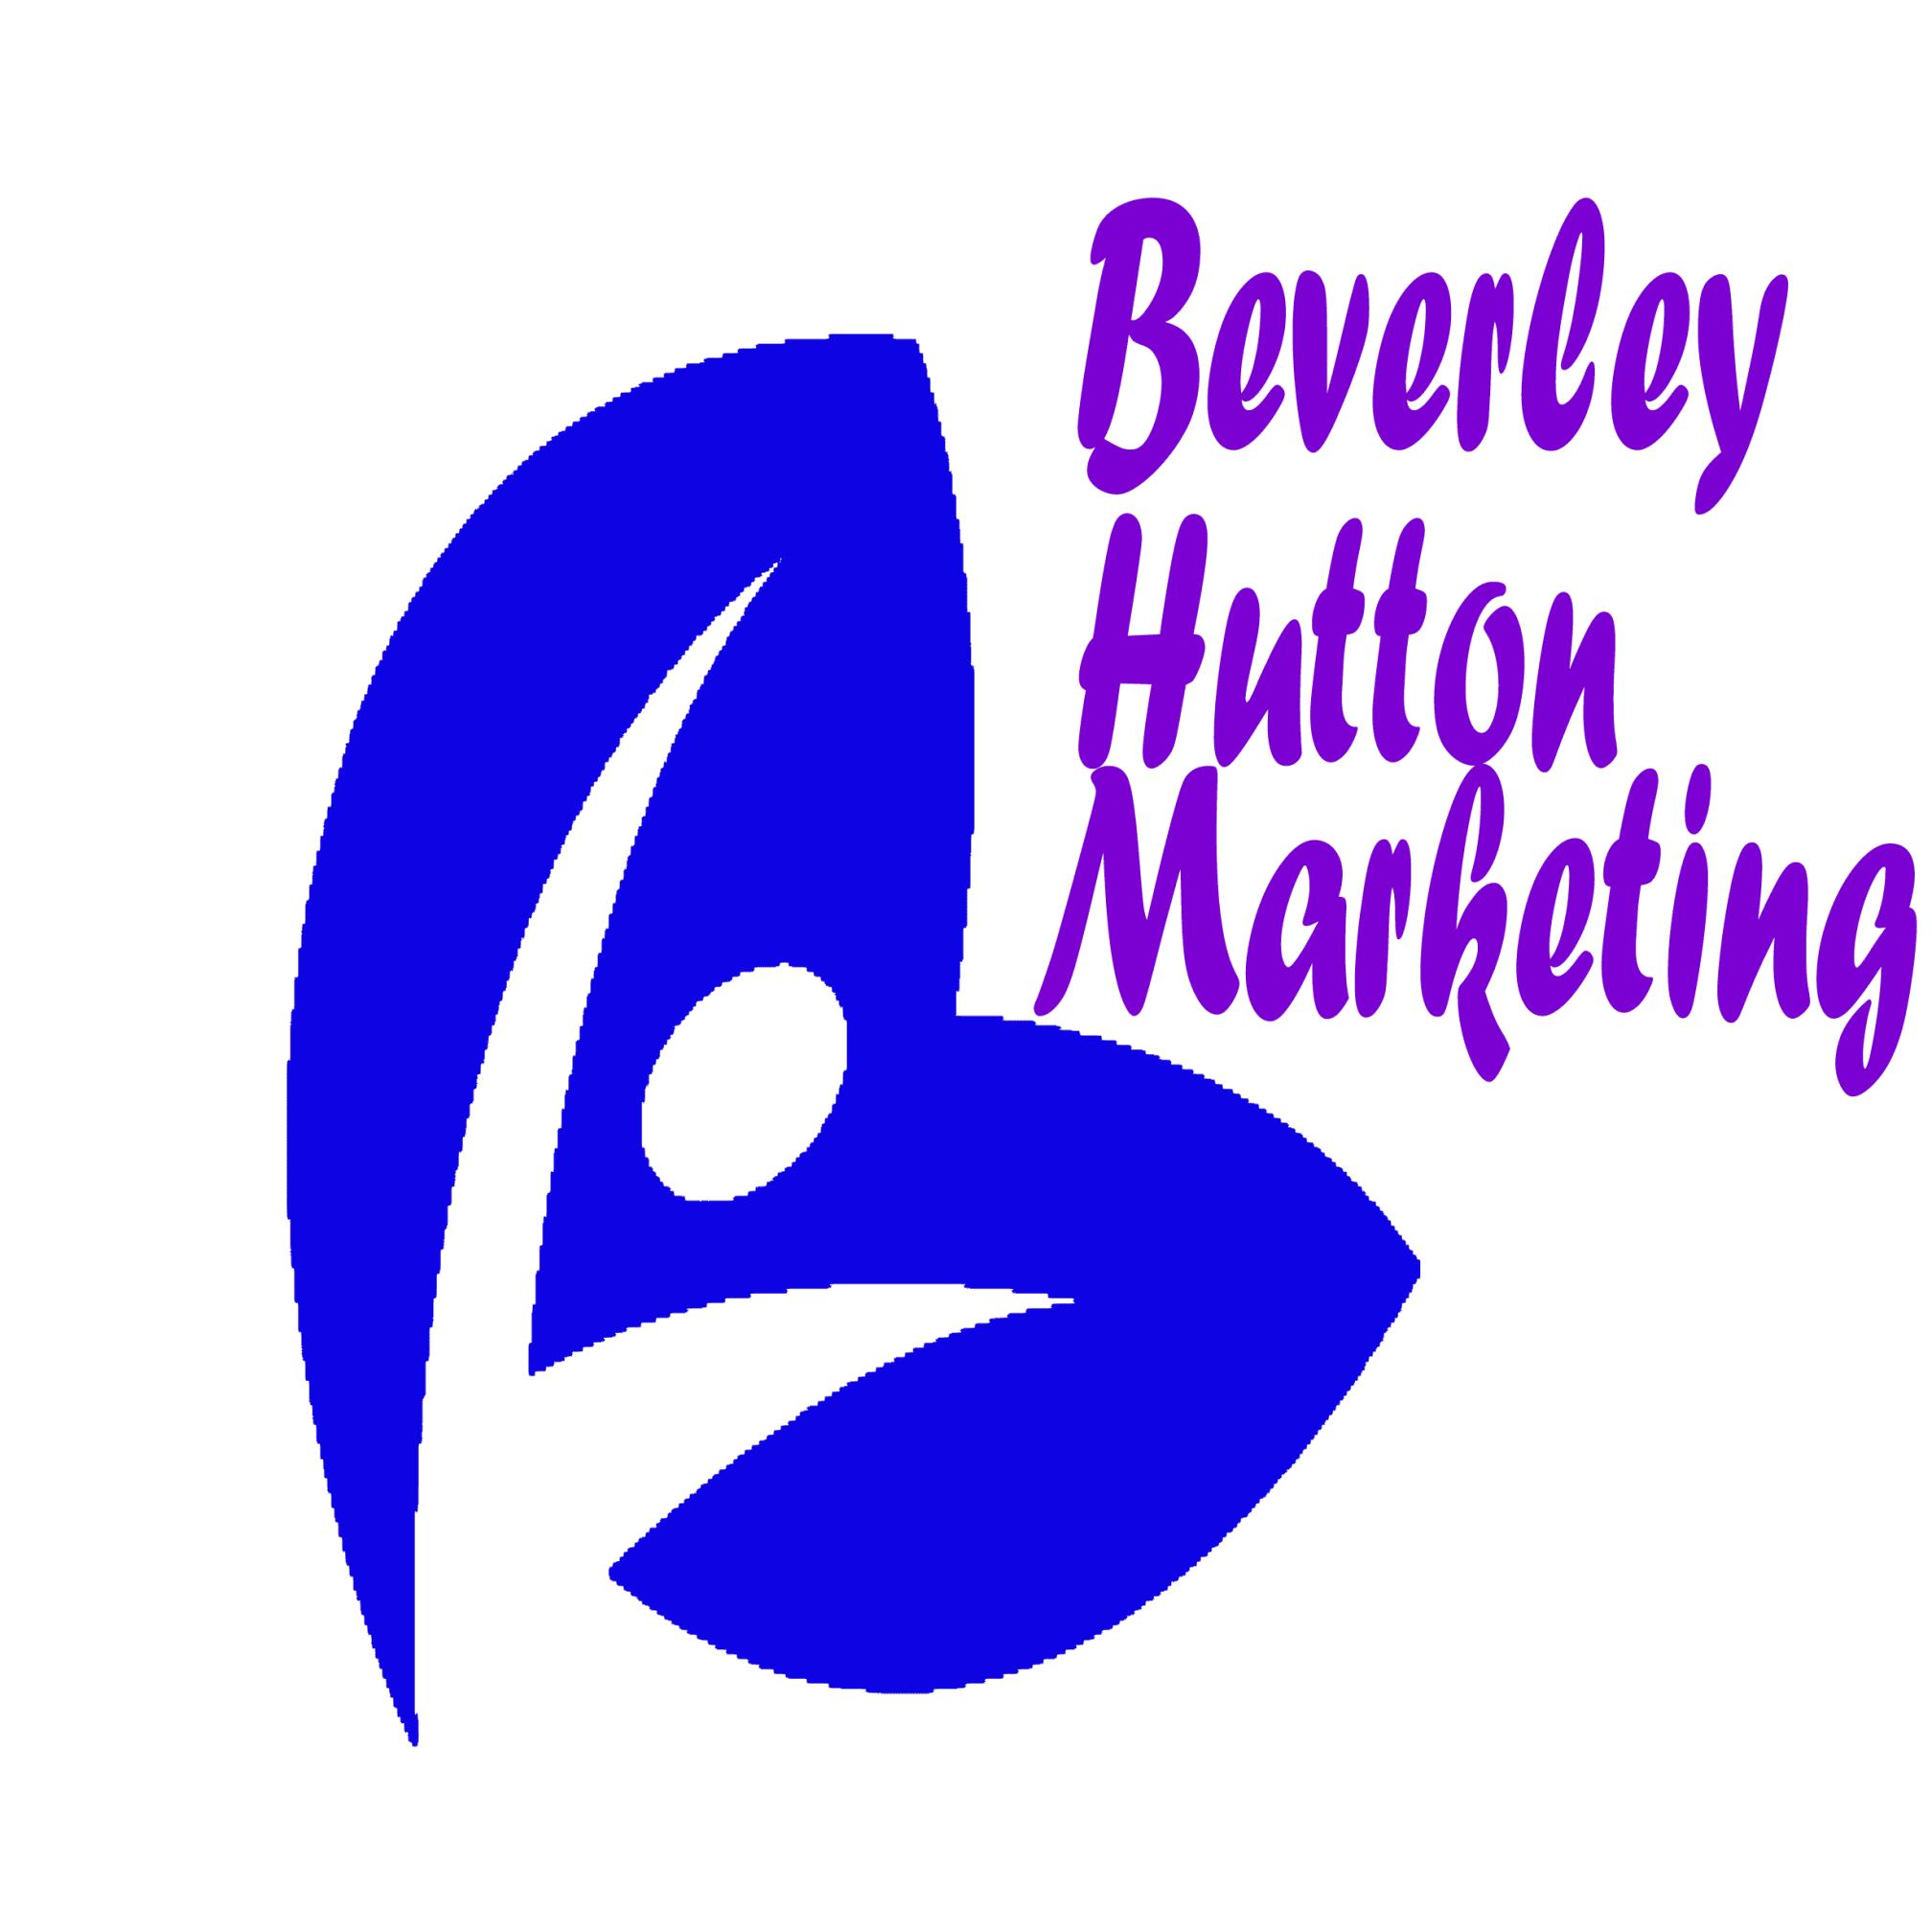 Beverley Hutton Marketing - Brockenhurst, Hampshire SO42 7YA - 01590 288008 | ShowMeLocal.com